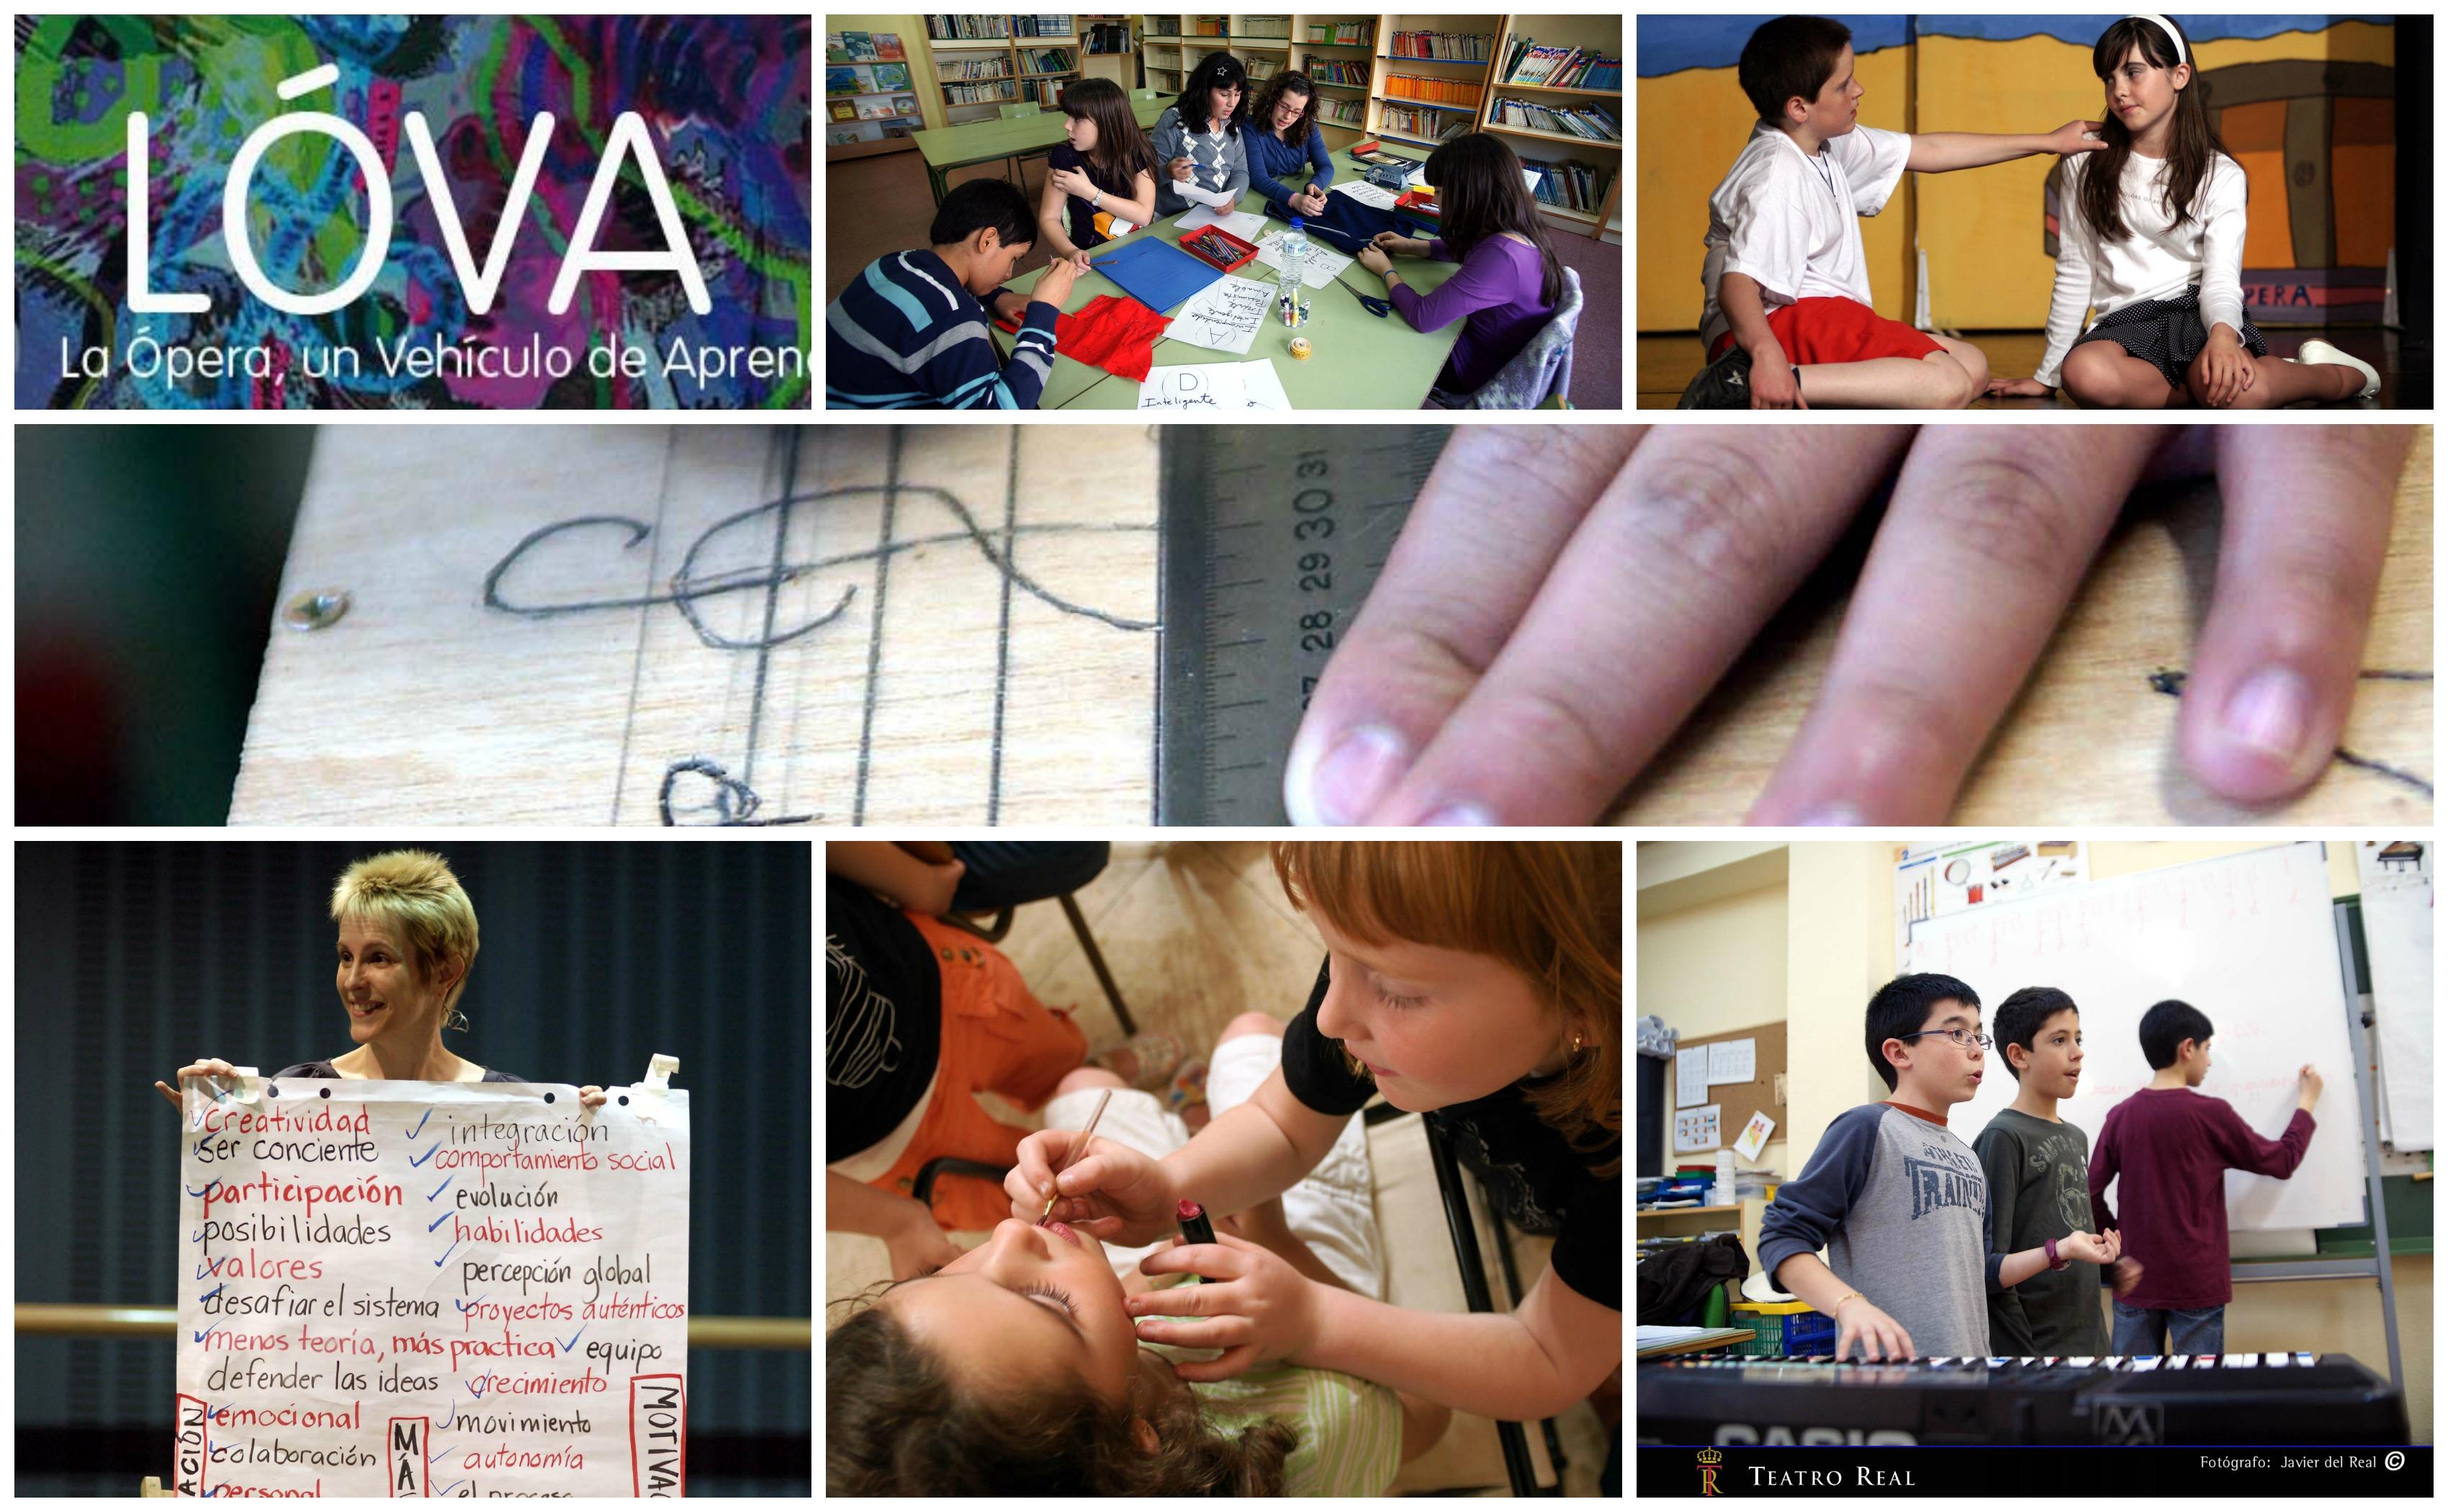 LOVA collage